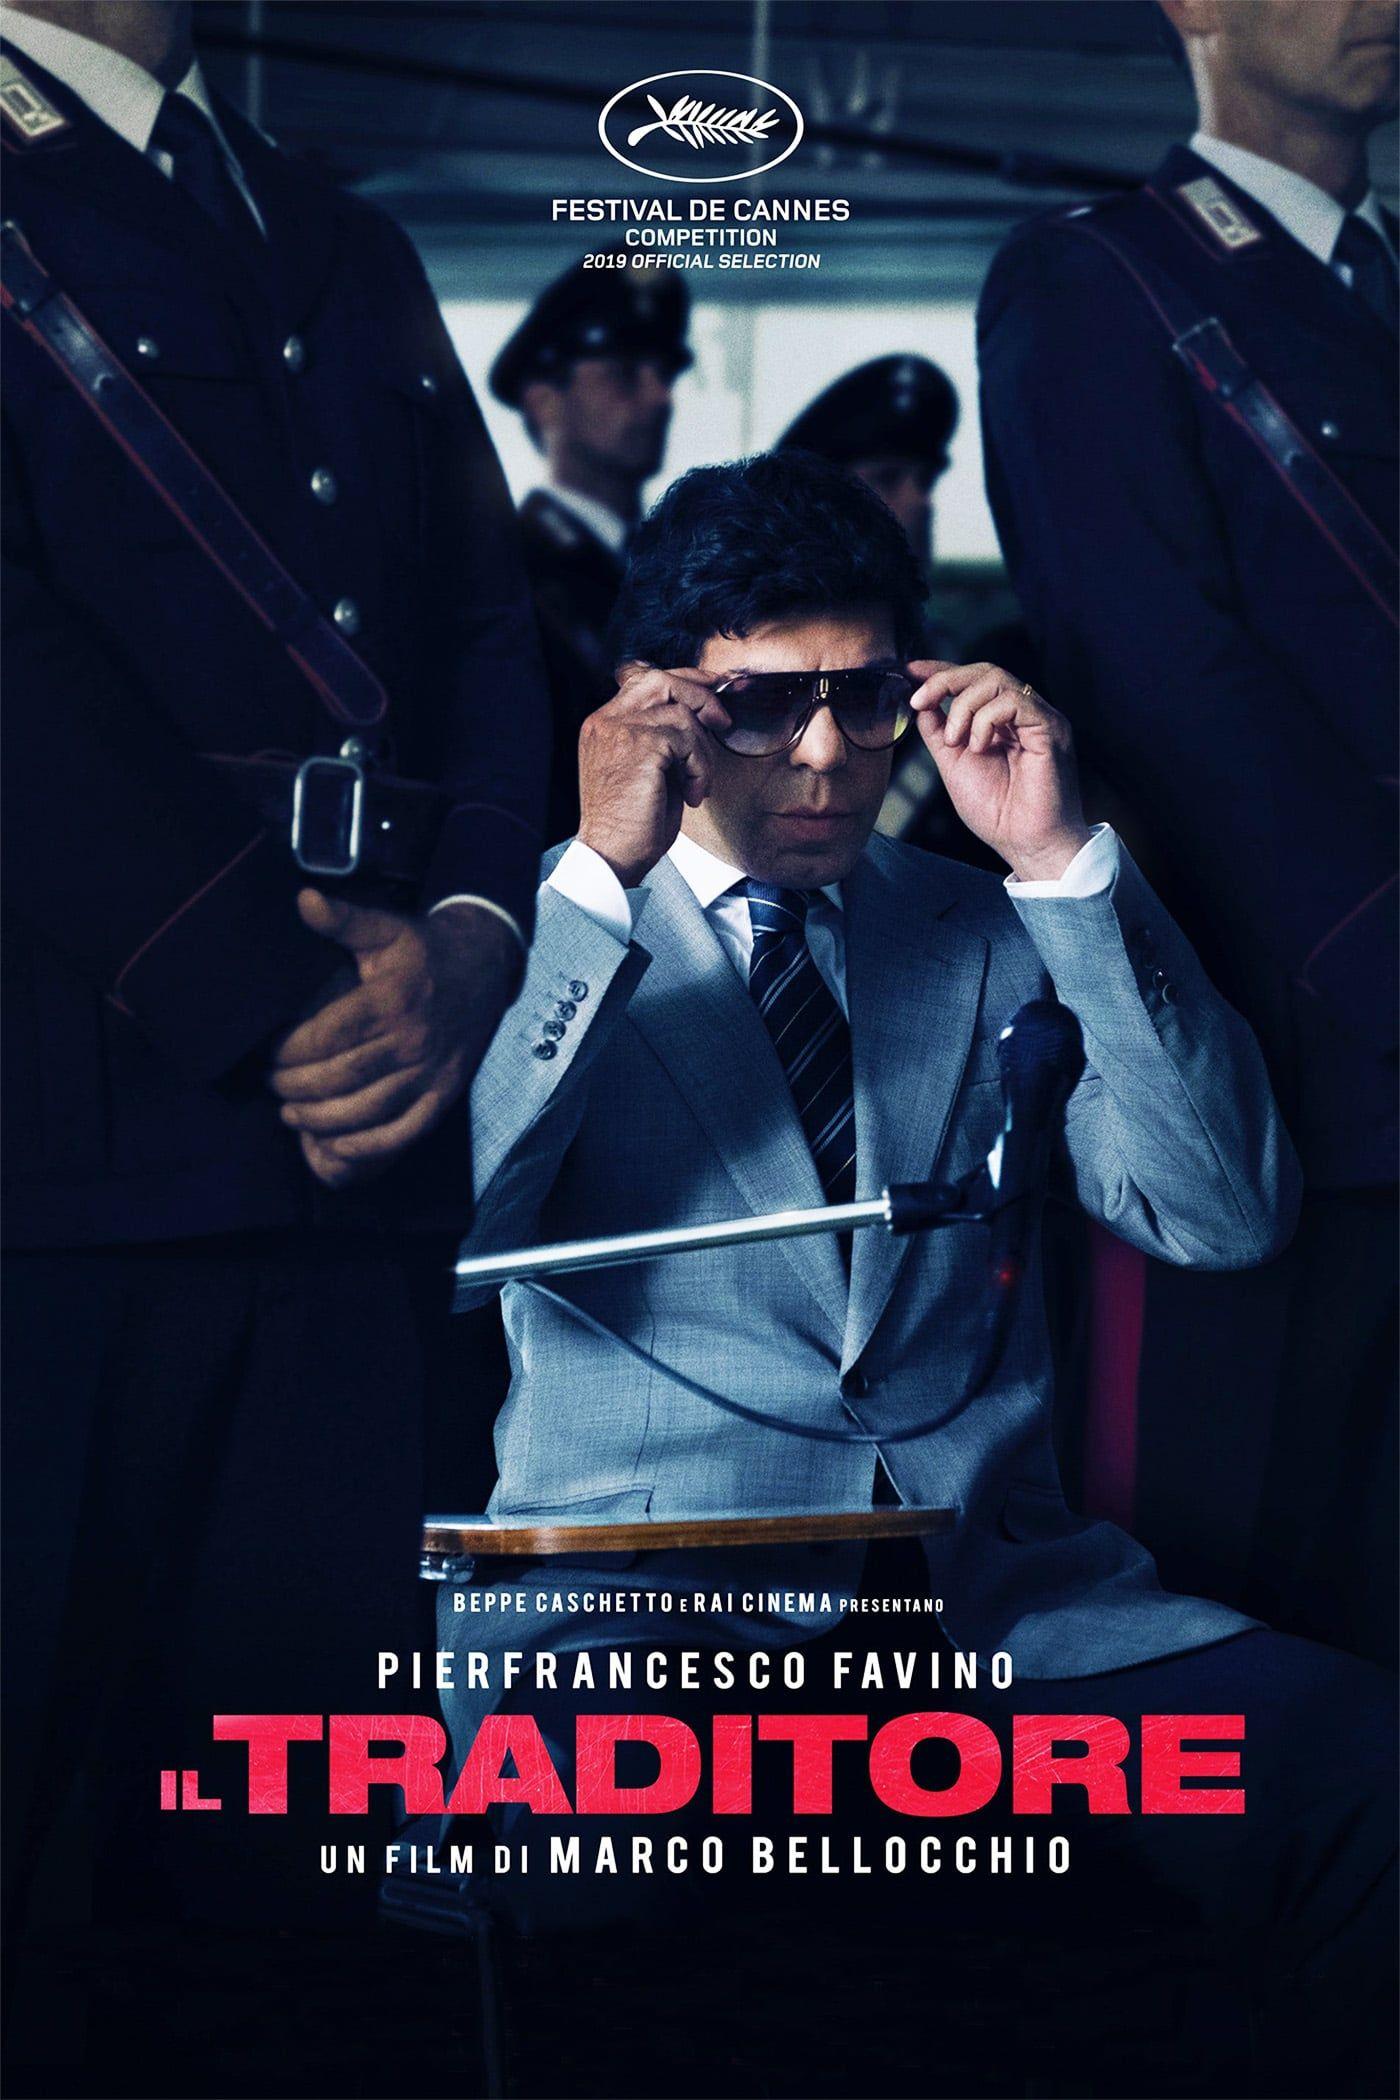 Ver Hd1080p The Traitor 2019 Pelicula Completa Online En Español Film